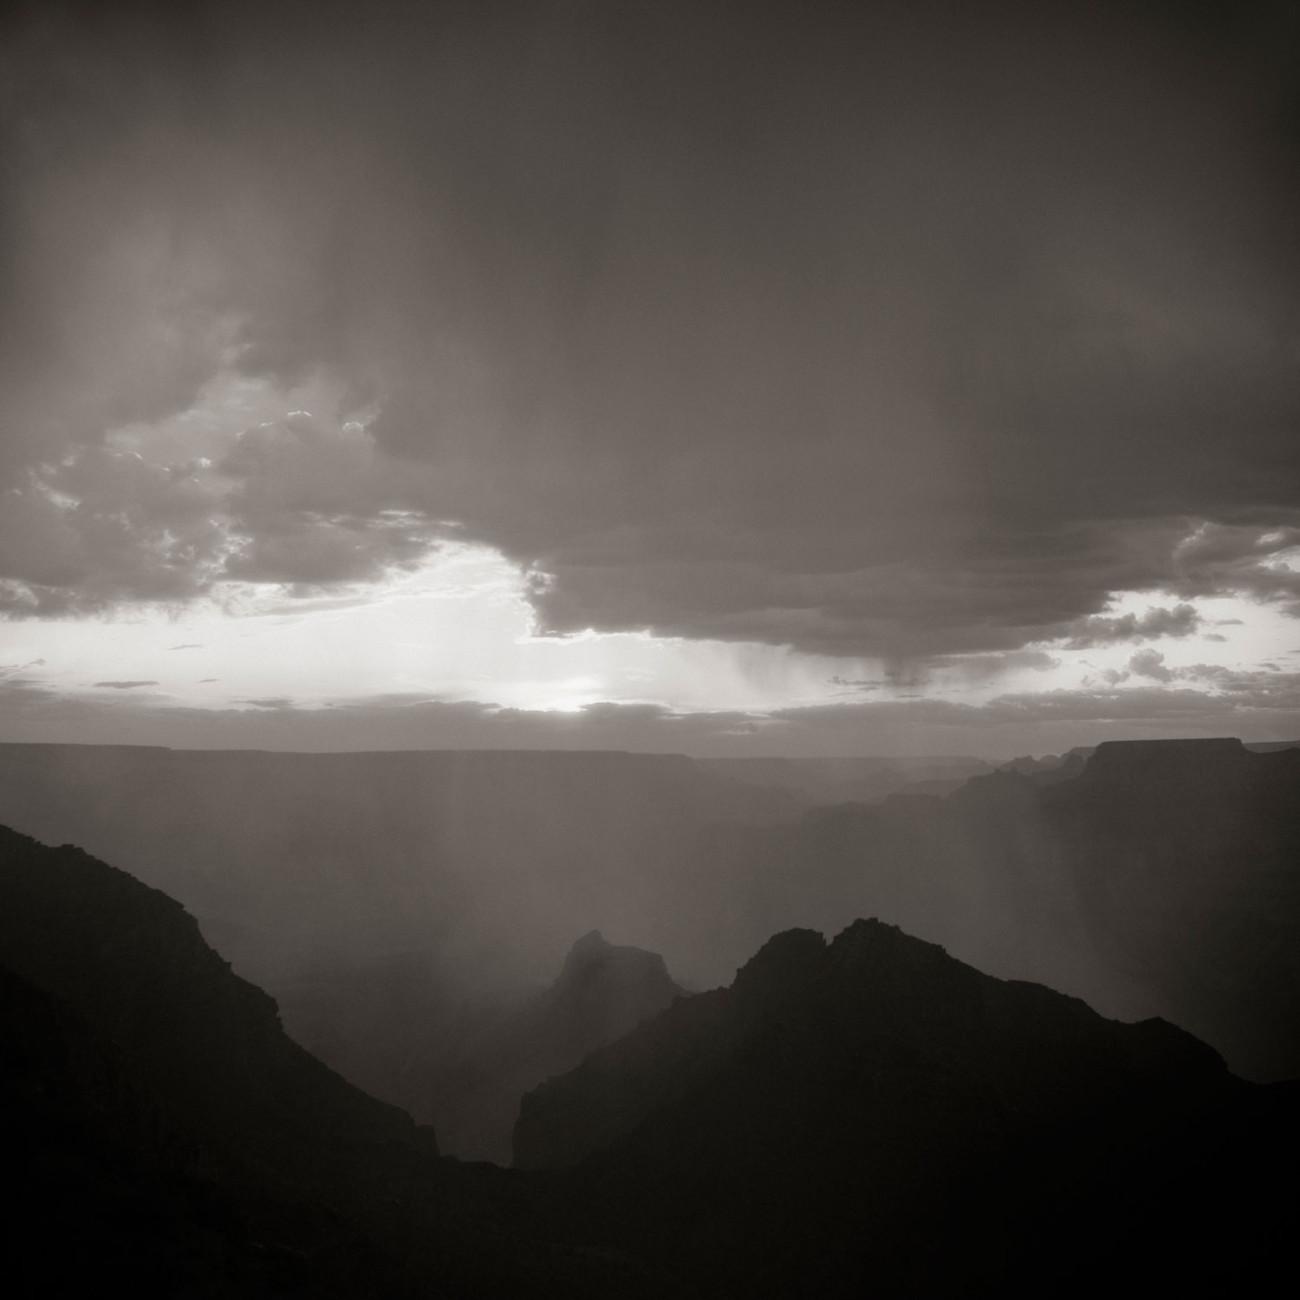 Clearing storm, Grand Canyon, Arizona, 2008